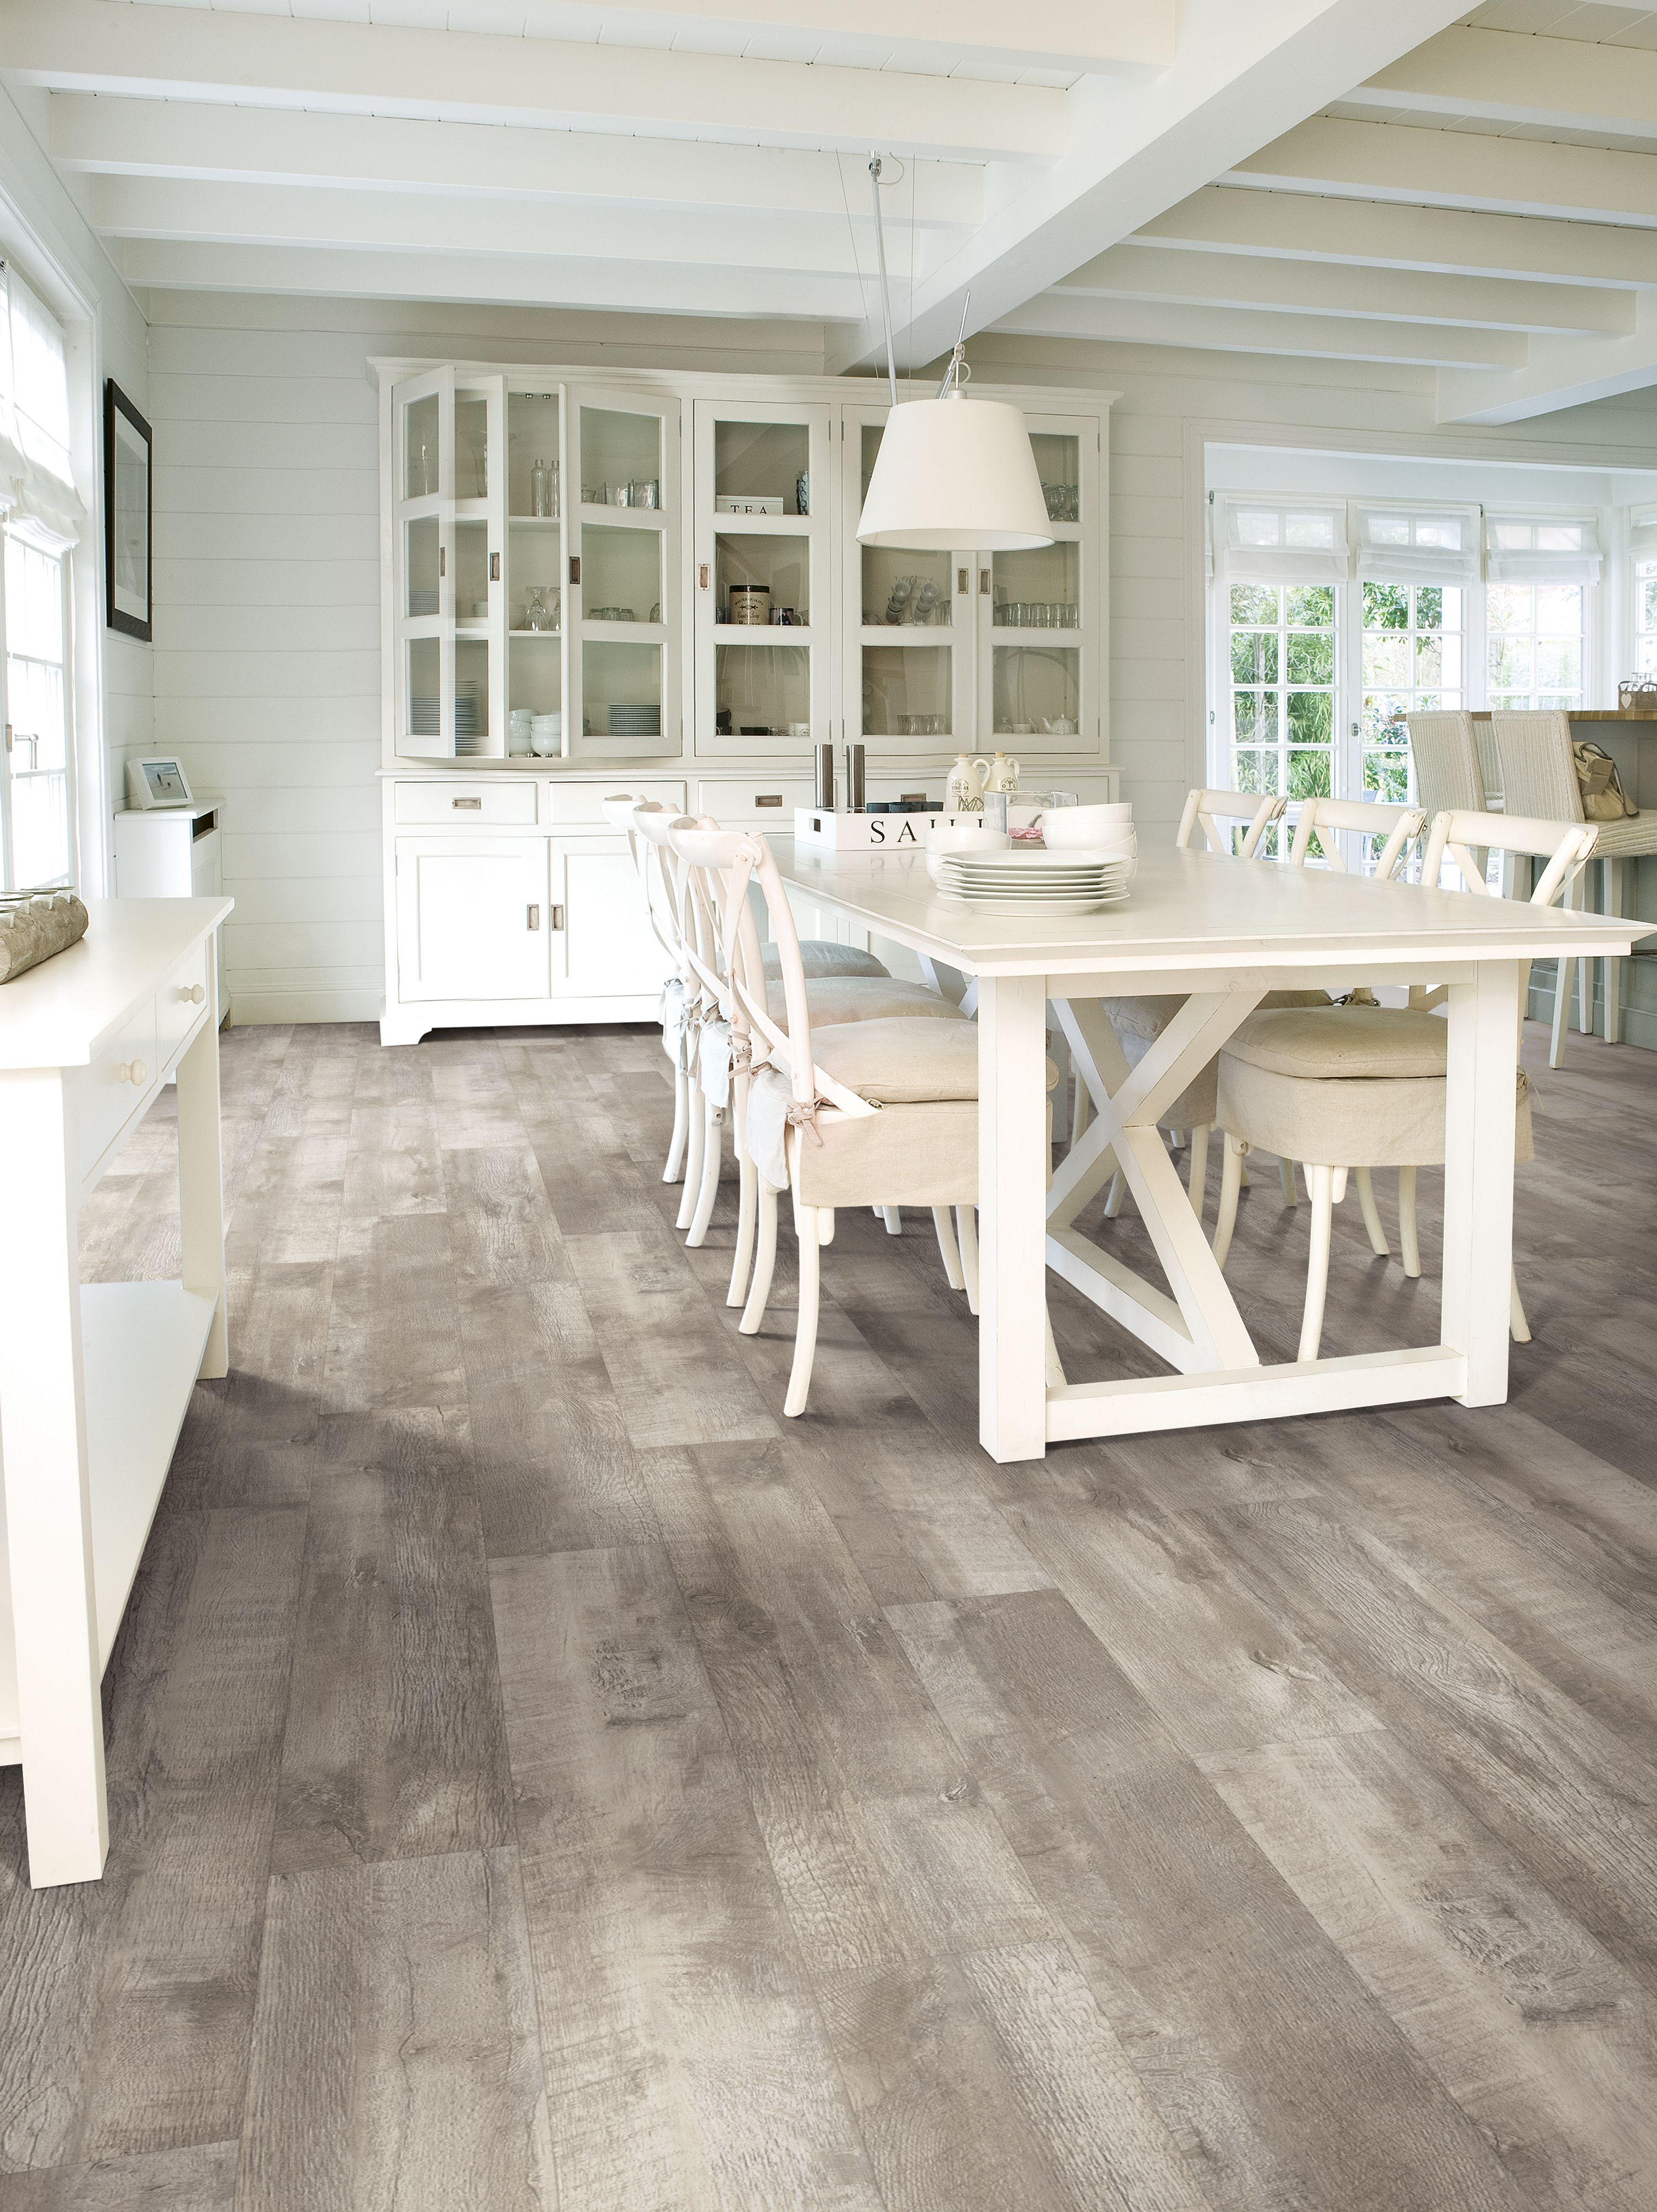 white washed oak hardwood flooring of ranch oak 076 laminate floors vitality laminate floors inside ranch oak 076 laminate floors parquet flooring laminate flooring floors grey